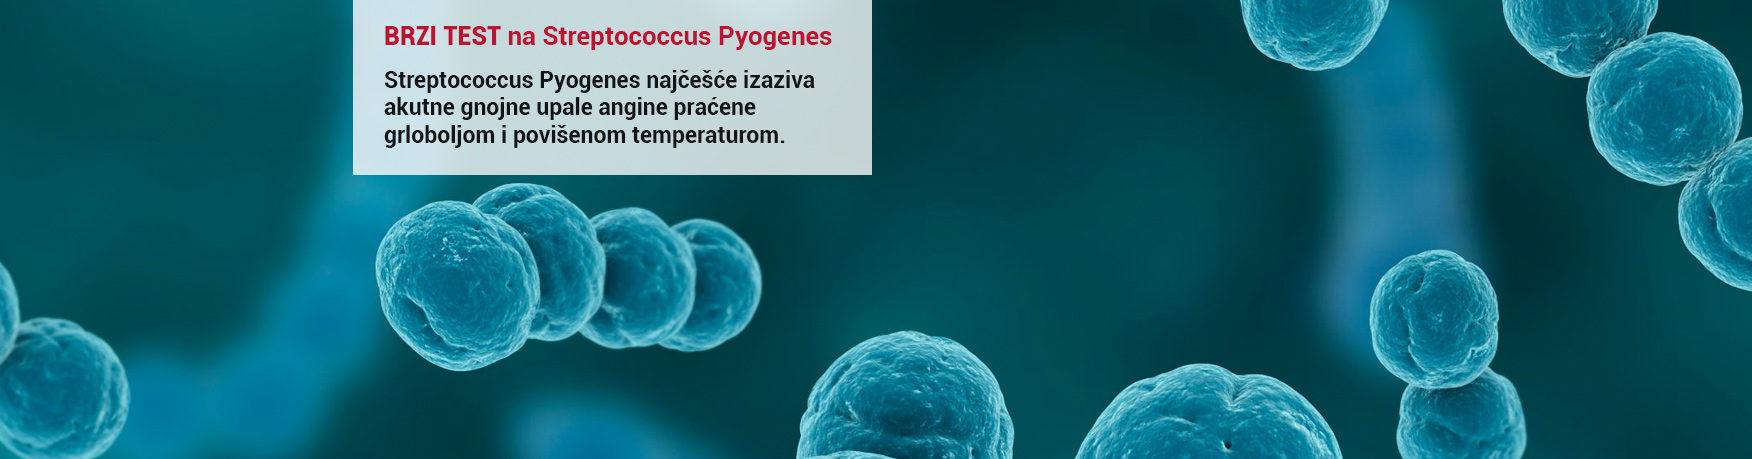 Brzi test na Streptococcus Pyogenes